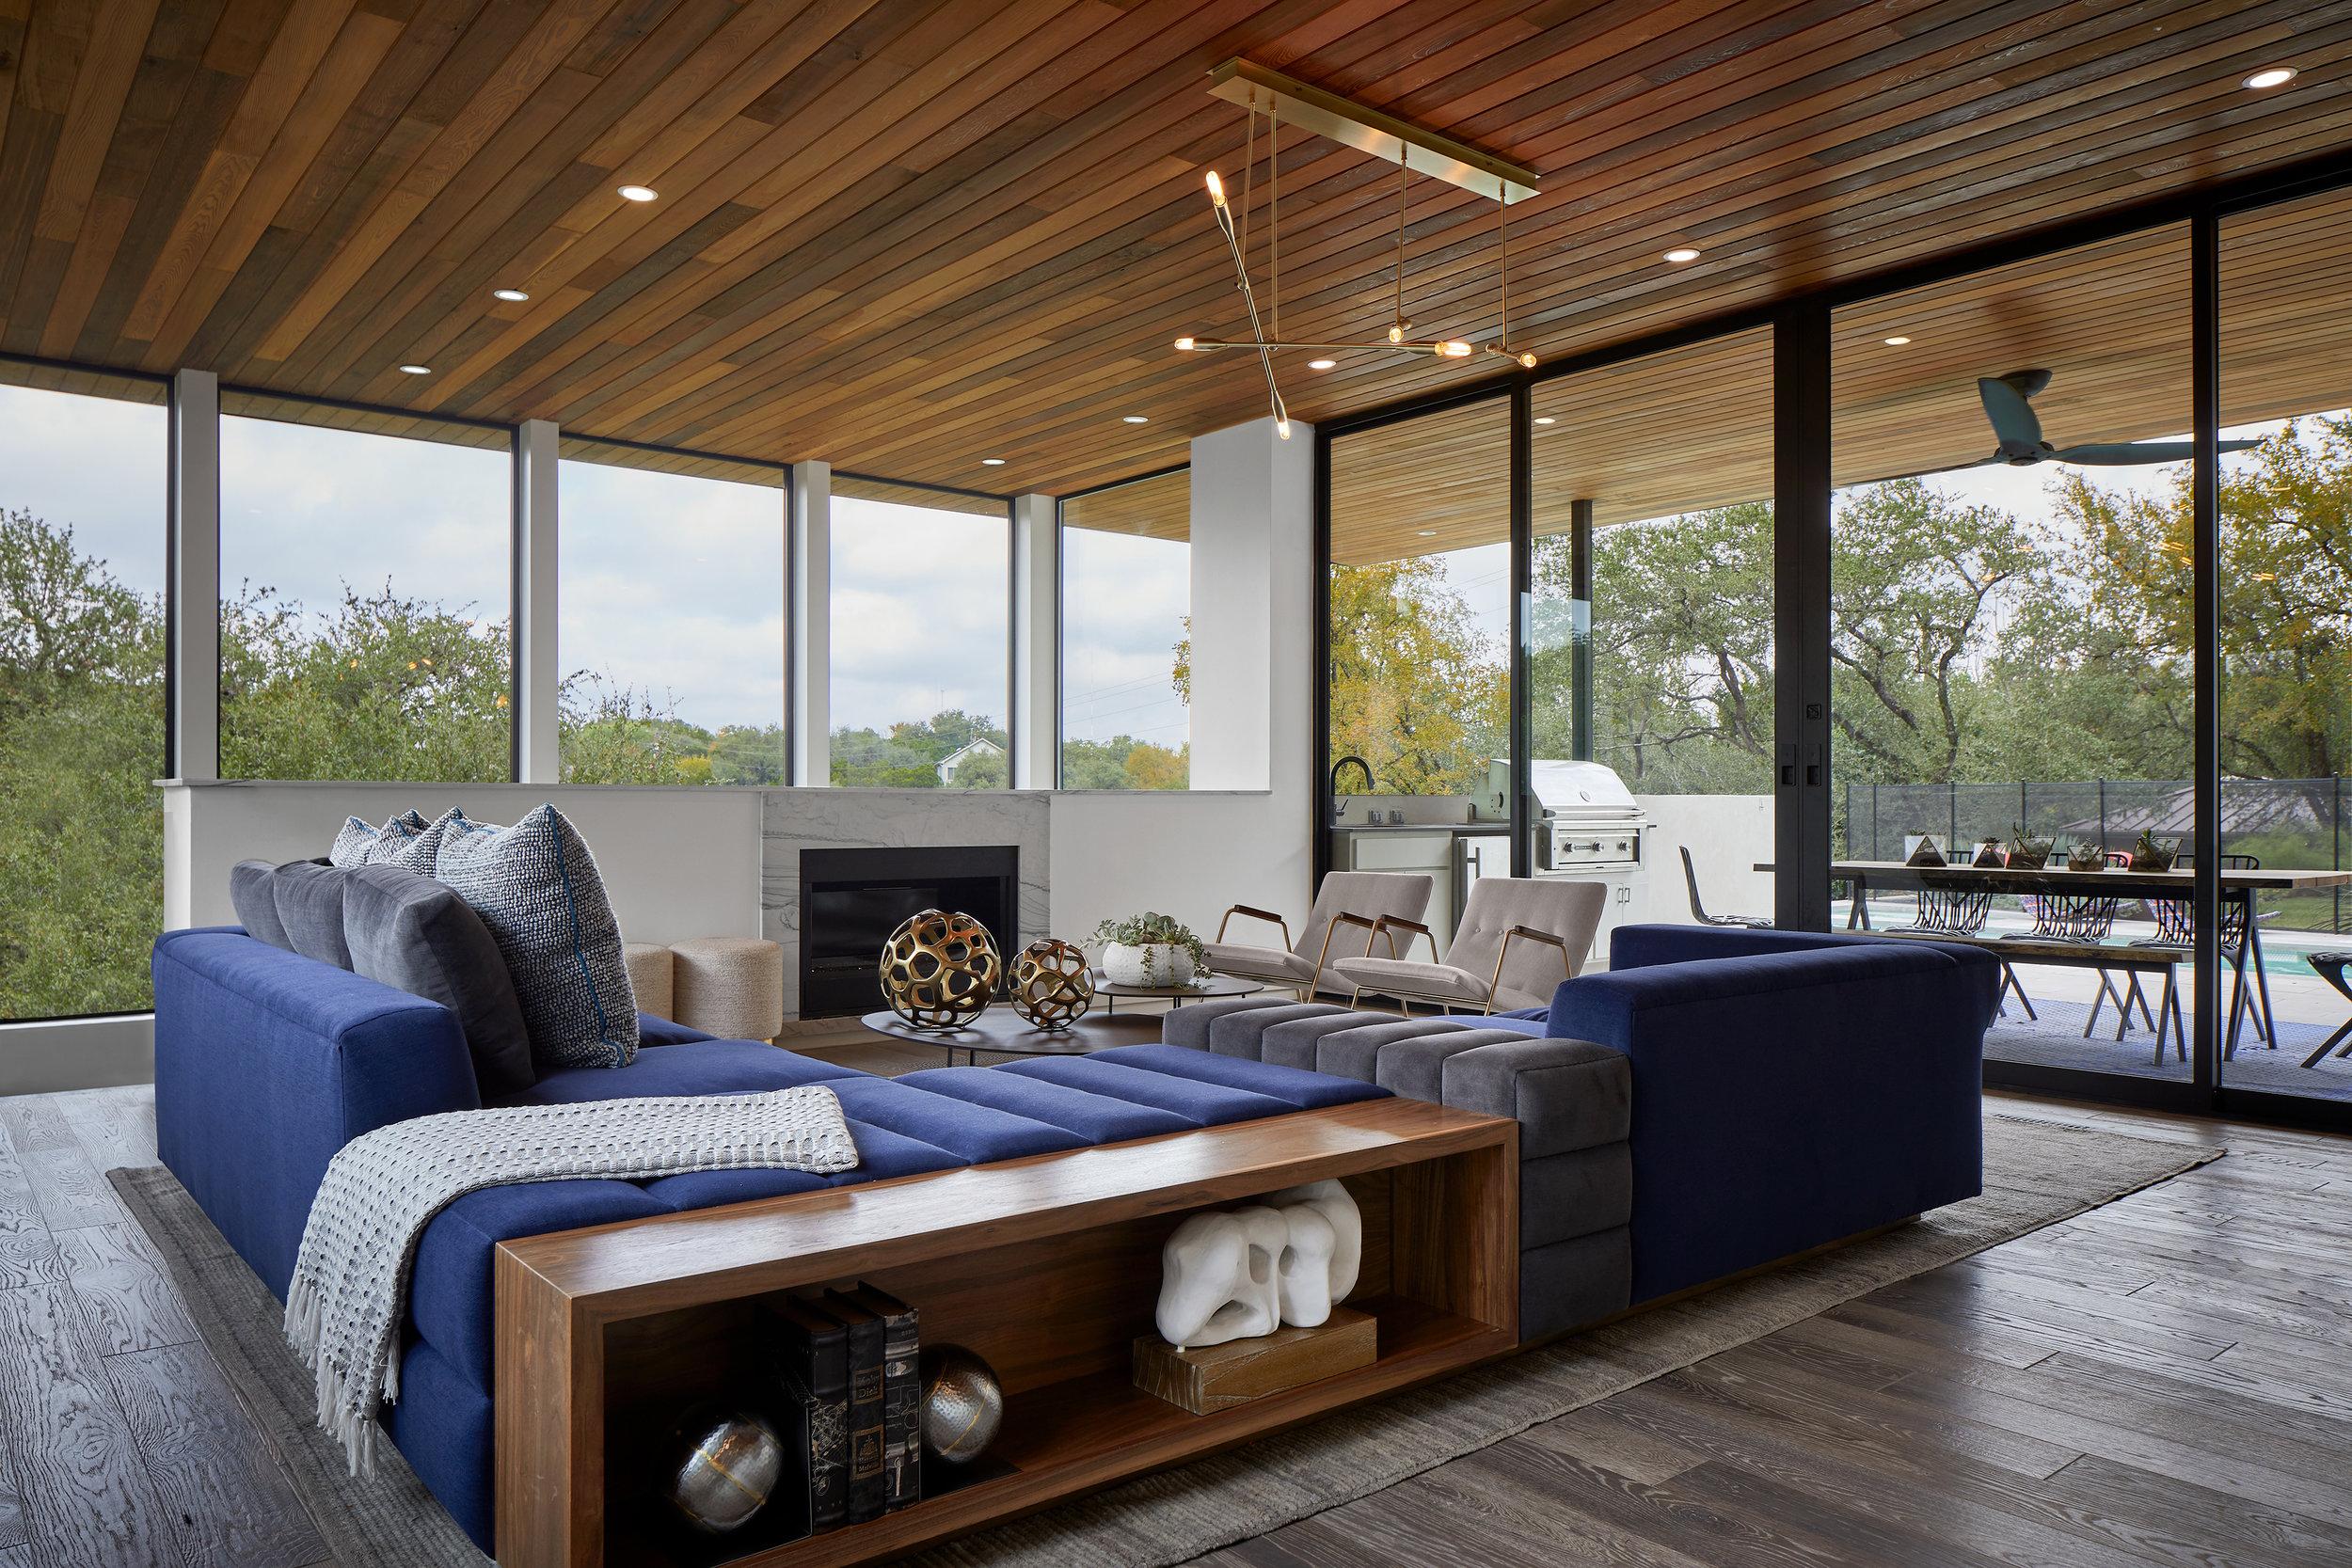 22 Matt Fajkus MF Architecture Bracketed Space House_Dror Baldinger.jpg